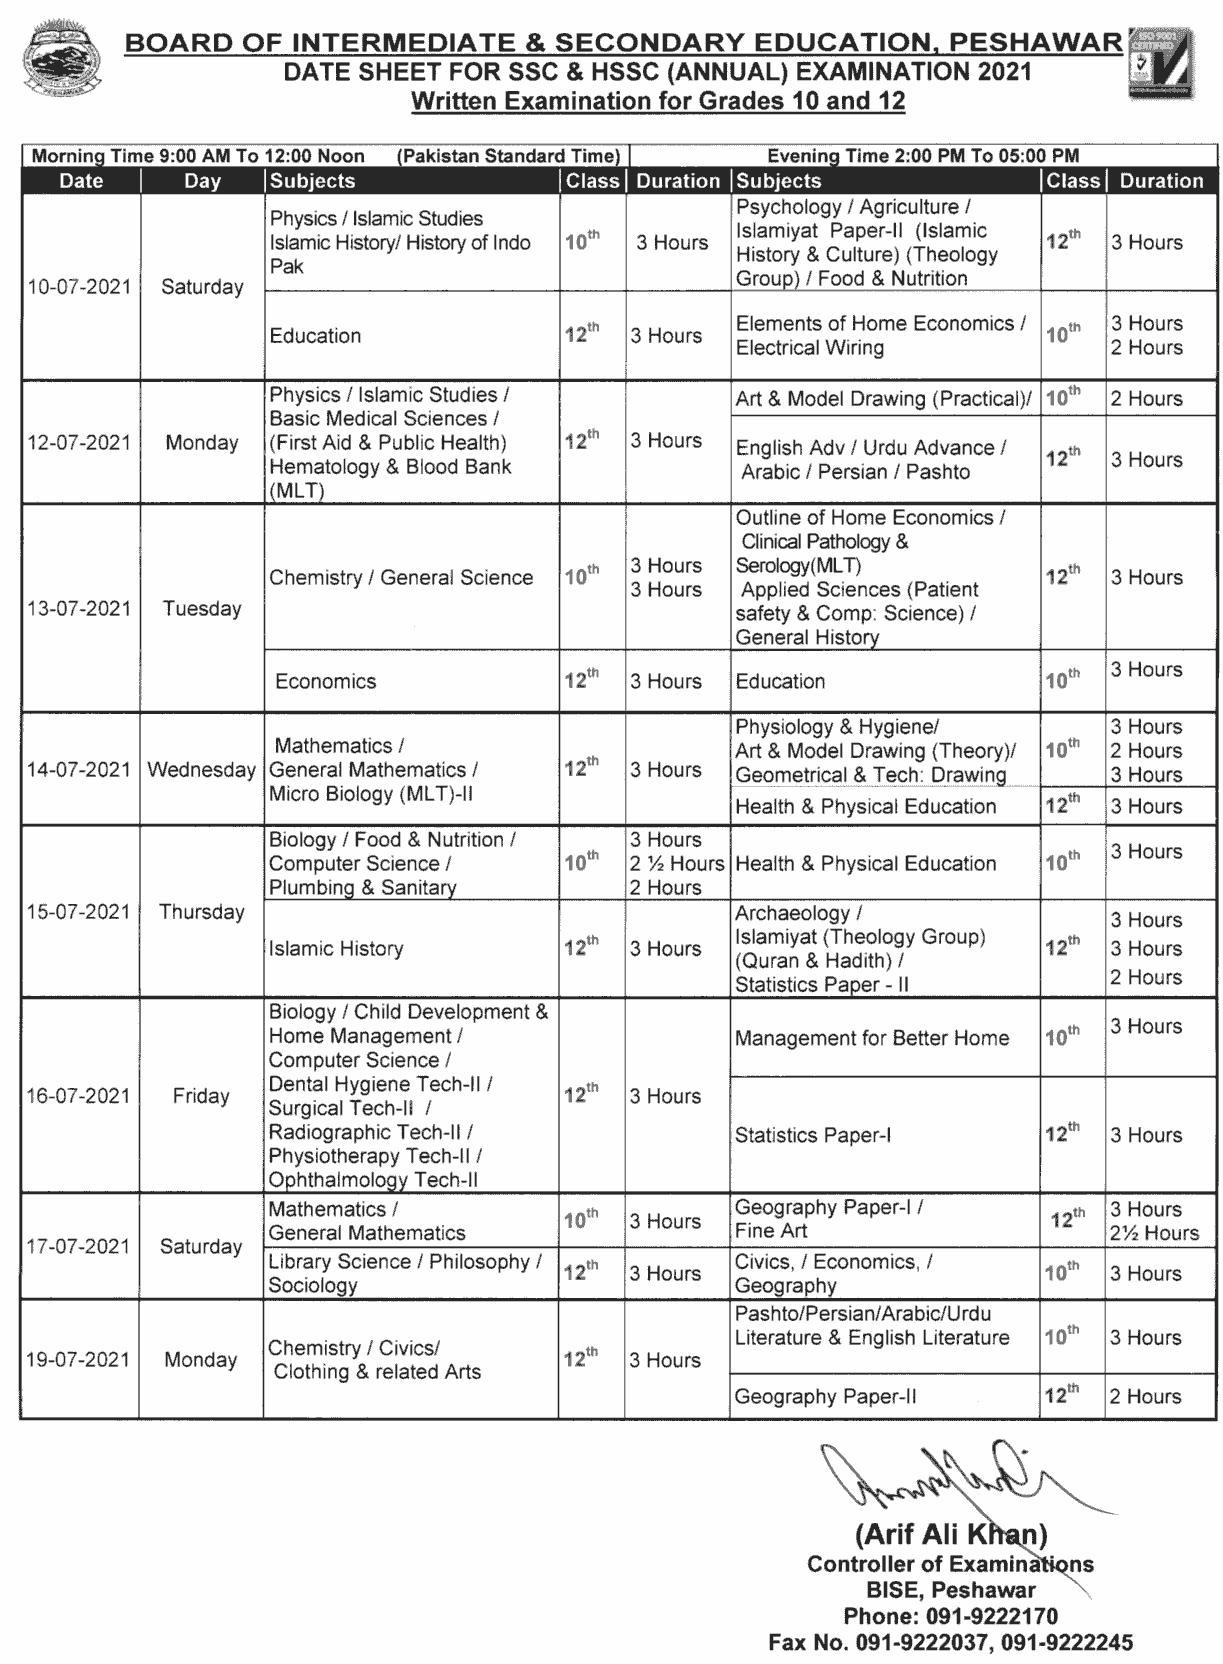 BISE Peshawar Board Date Sheet 2021 10th Class